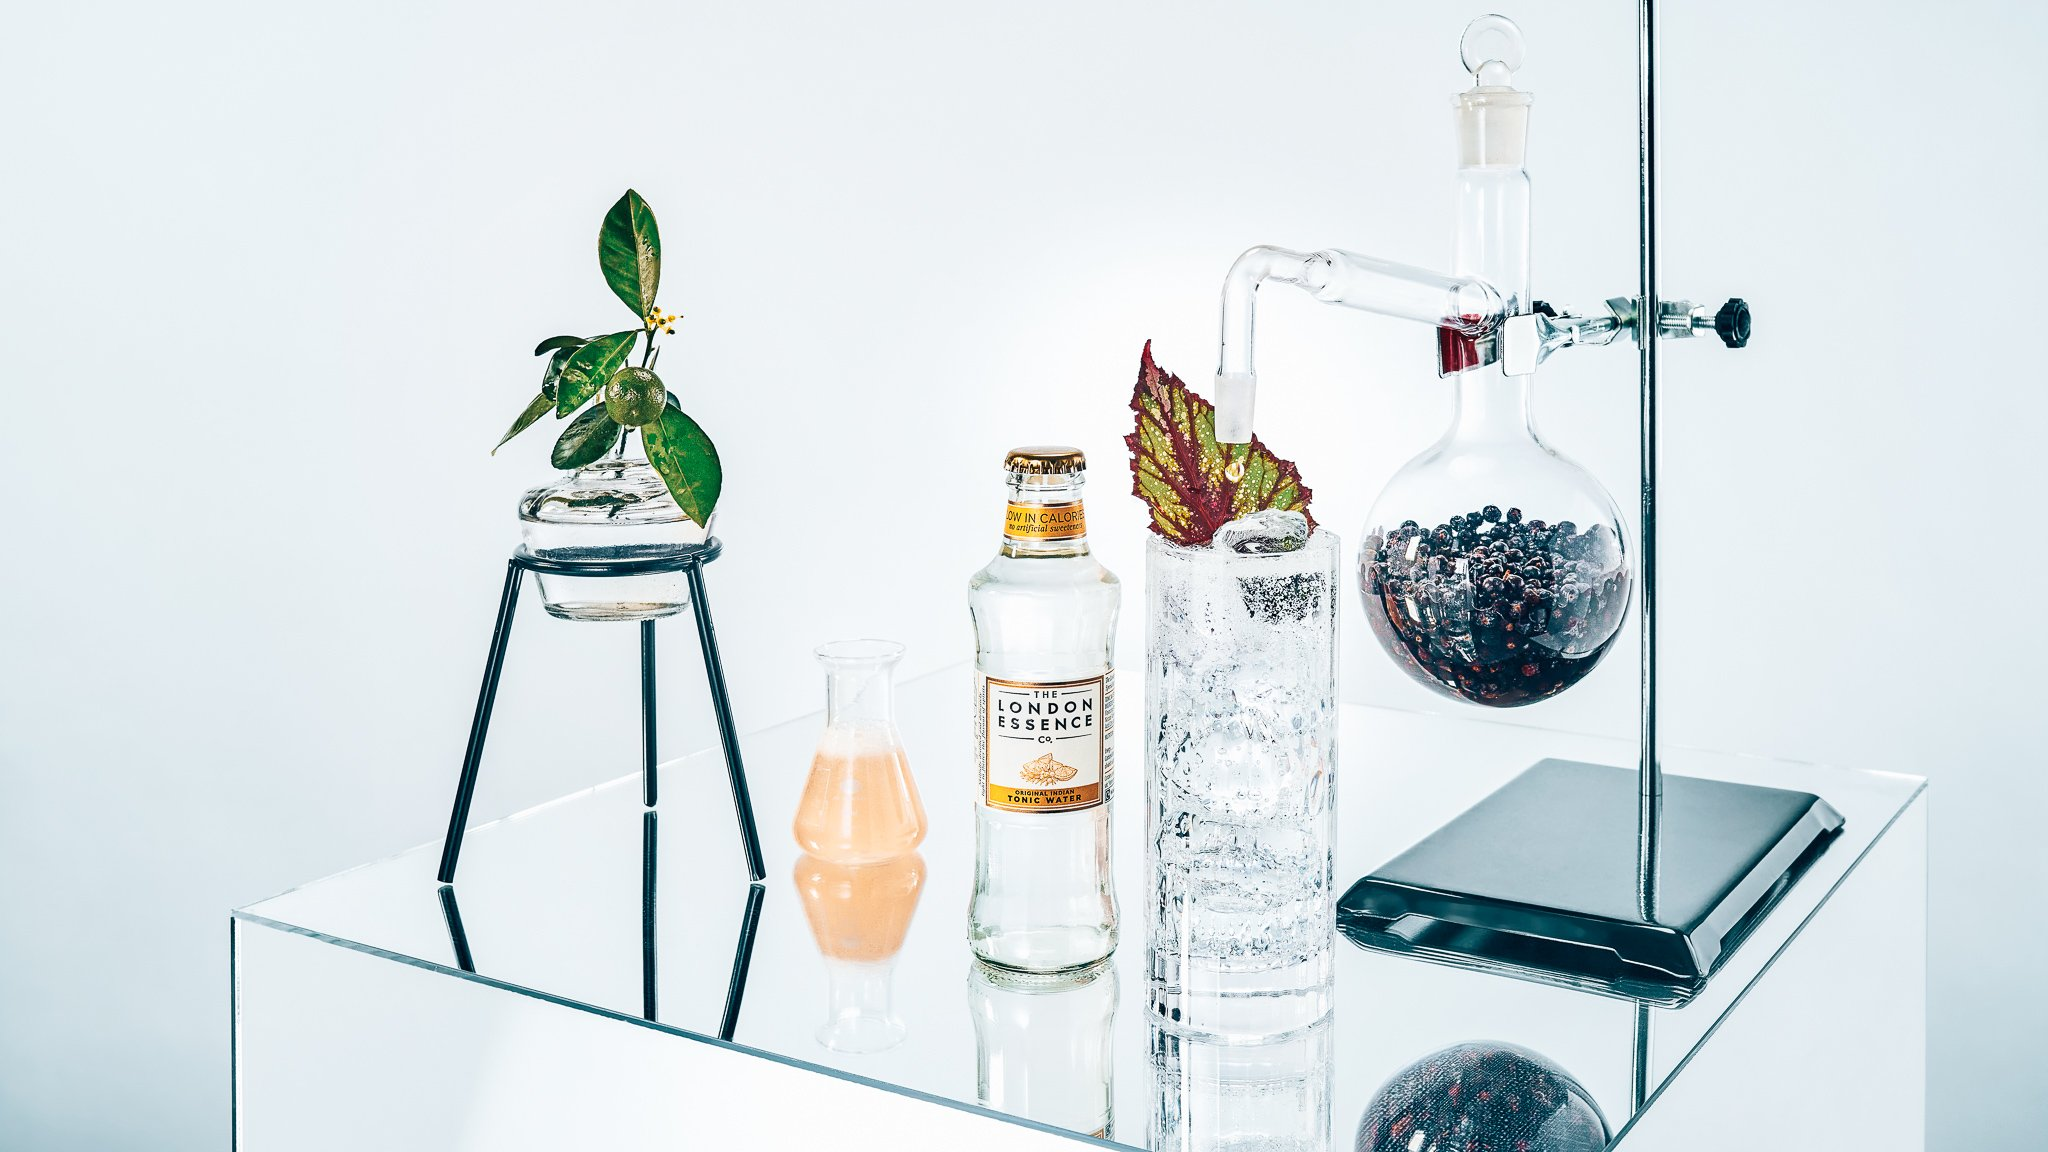 London Essence mixers, spotlight tonic, Alles over gin.